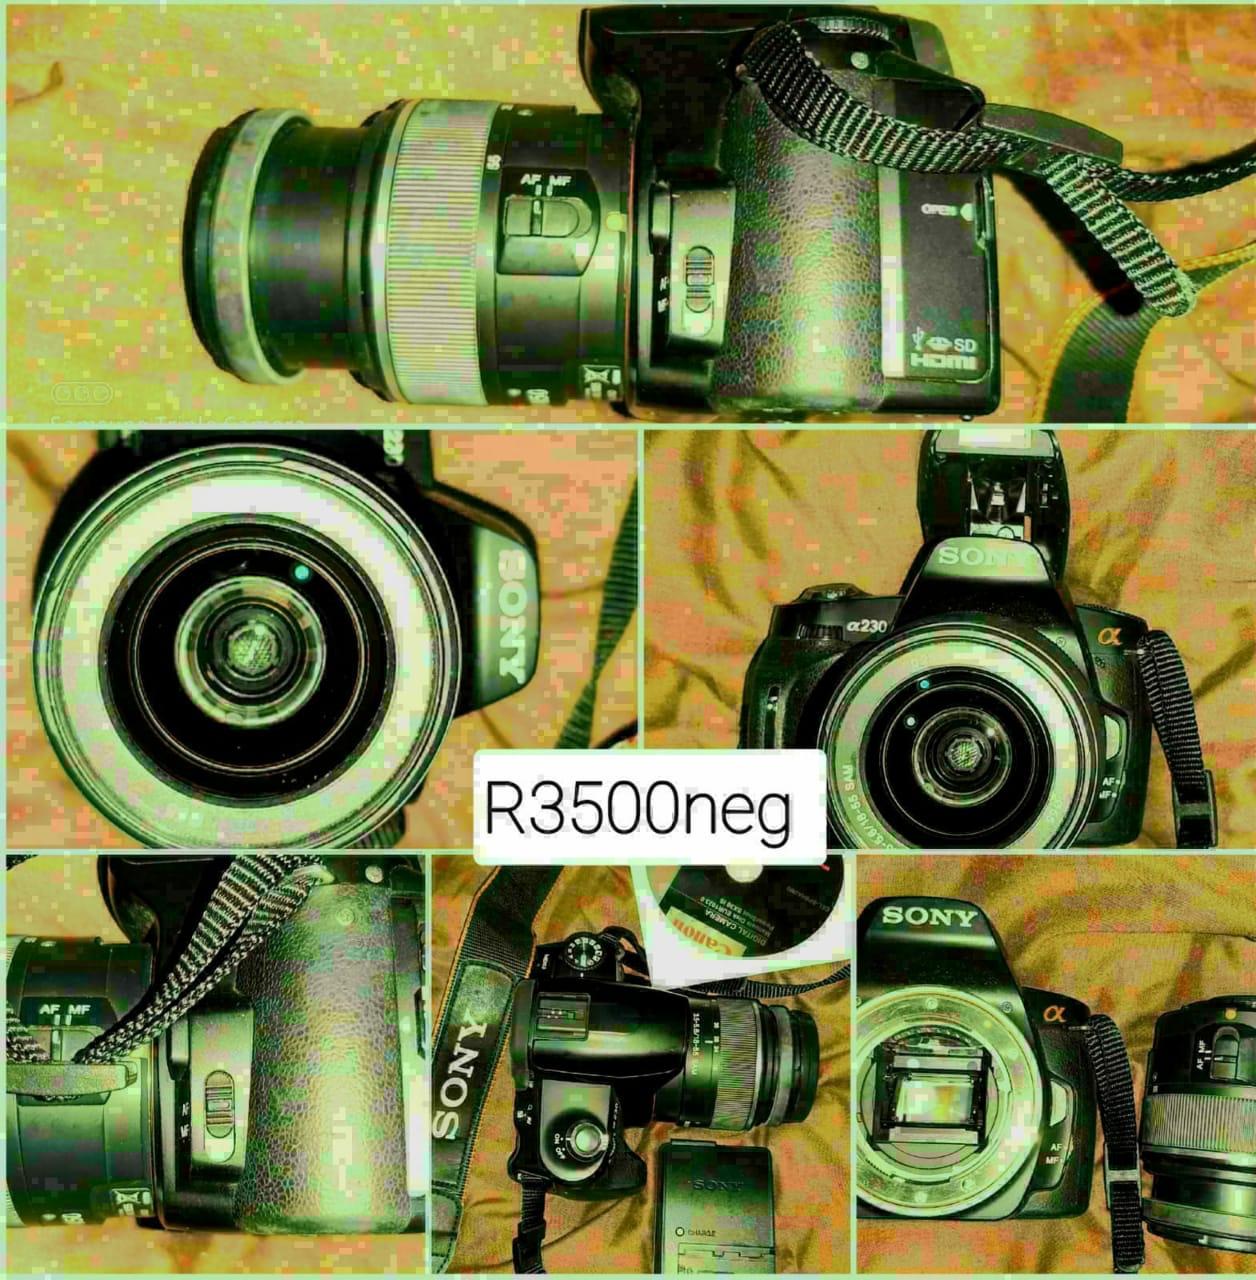 Sony DSLR-A230 Digital Camera